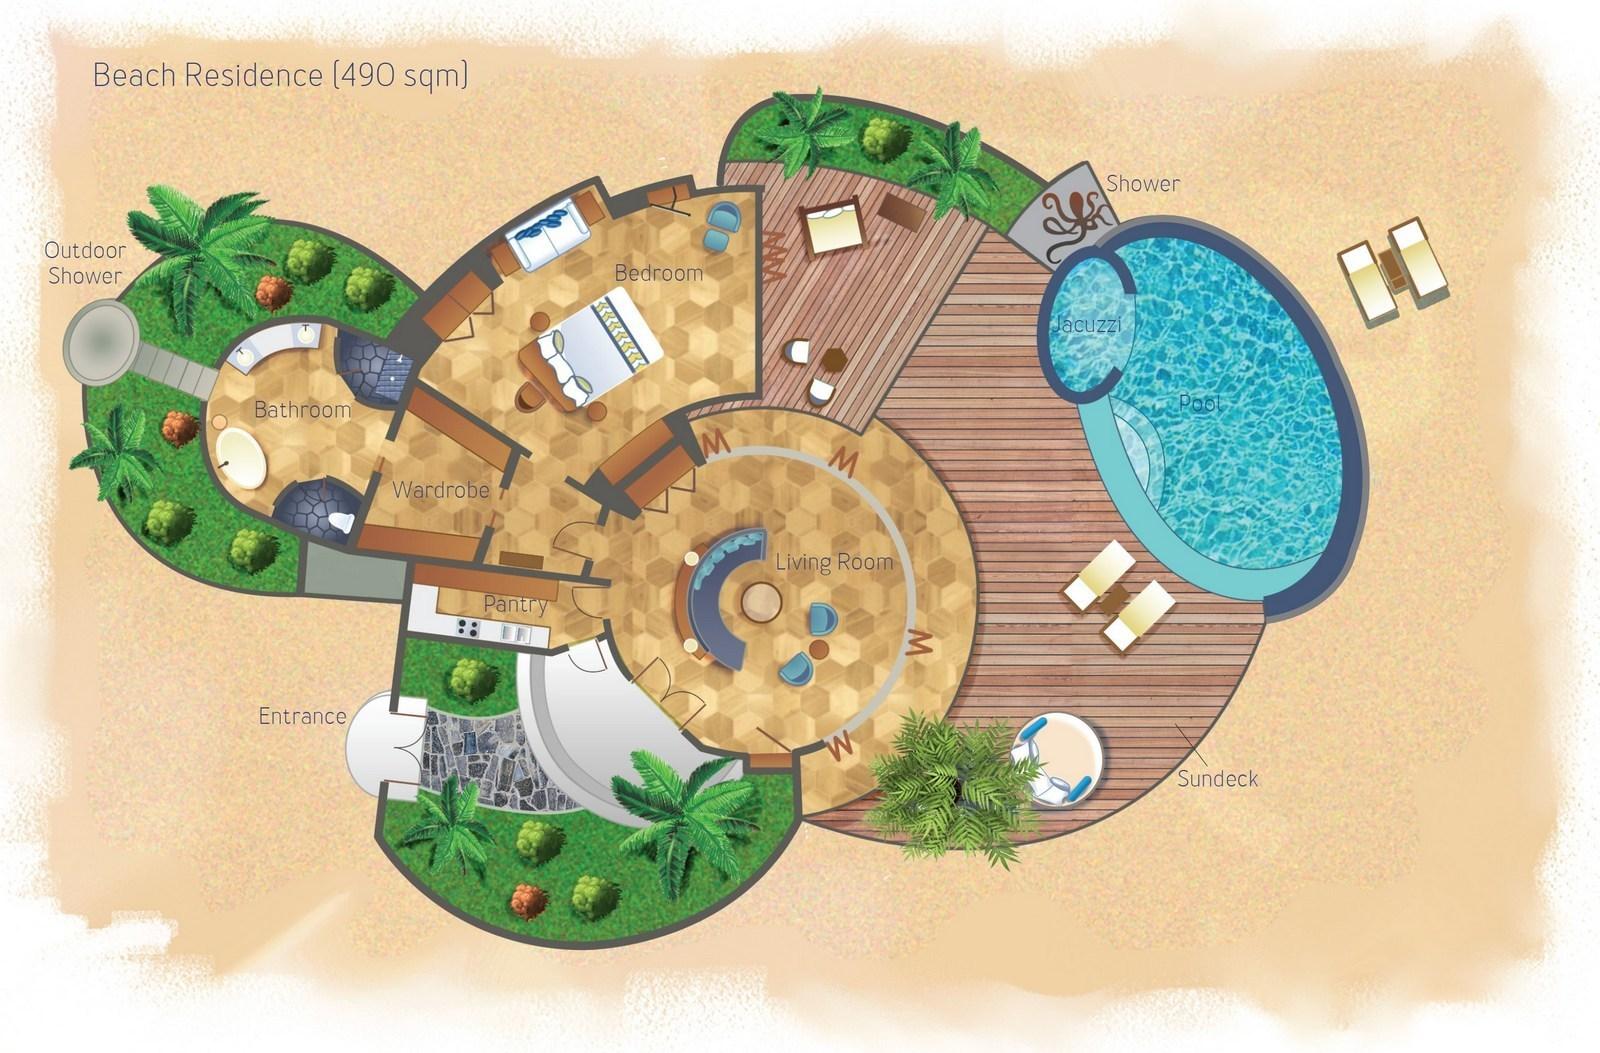 Мальдивы, отель Milaidhoo Island Maldives, план-схема номера Beach Residence